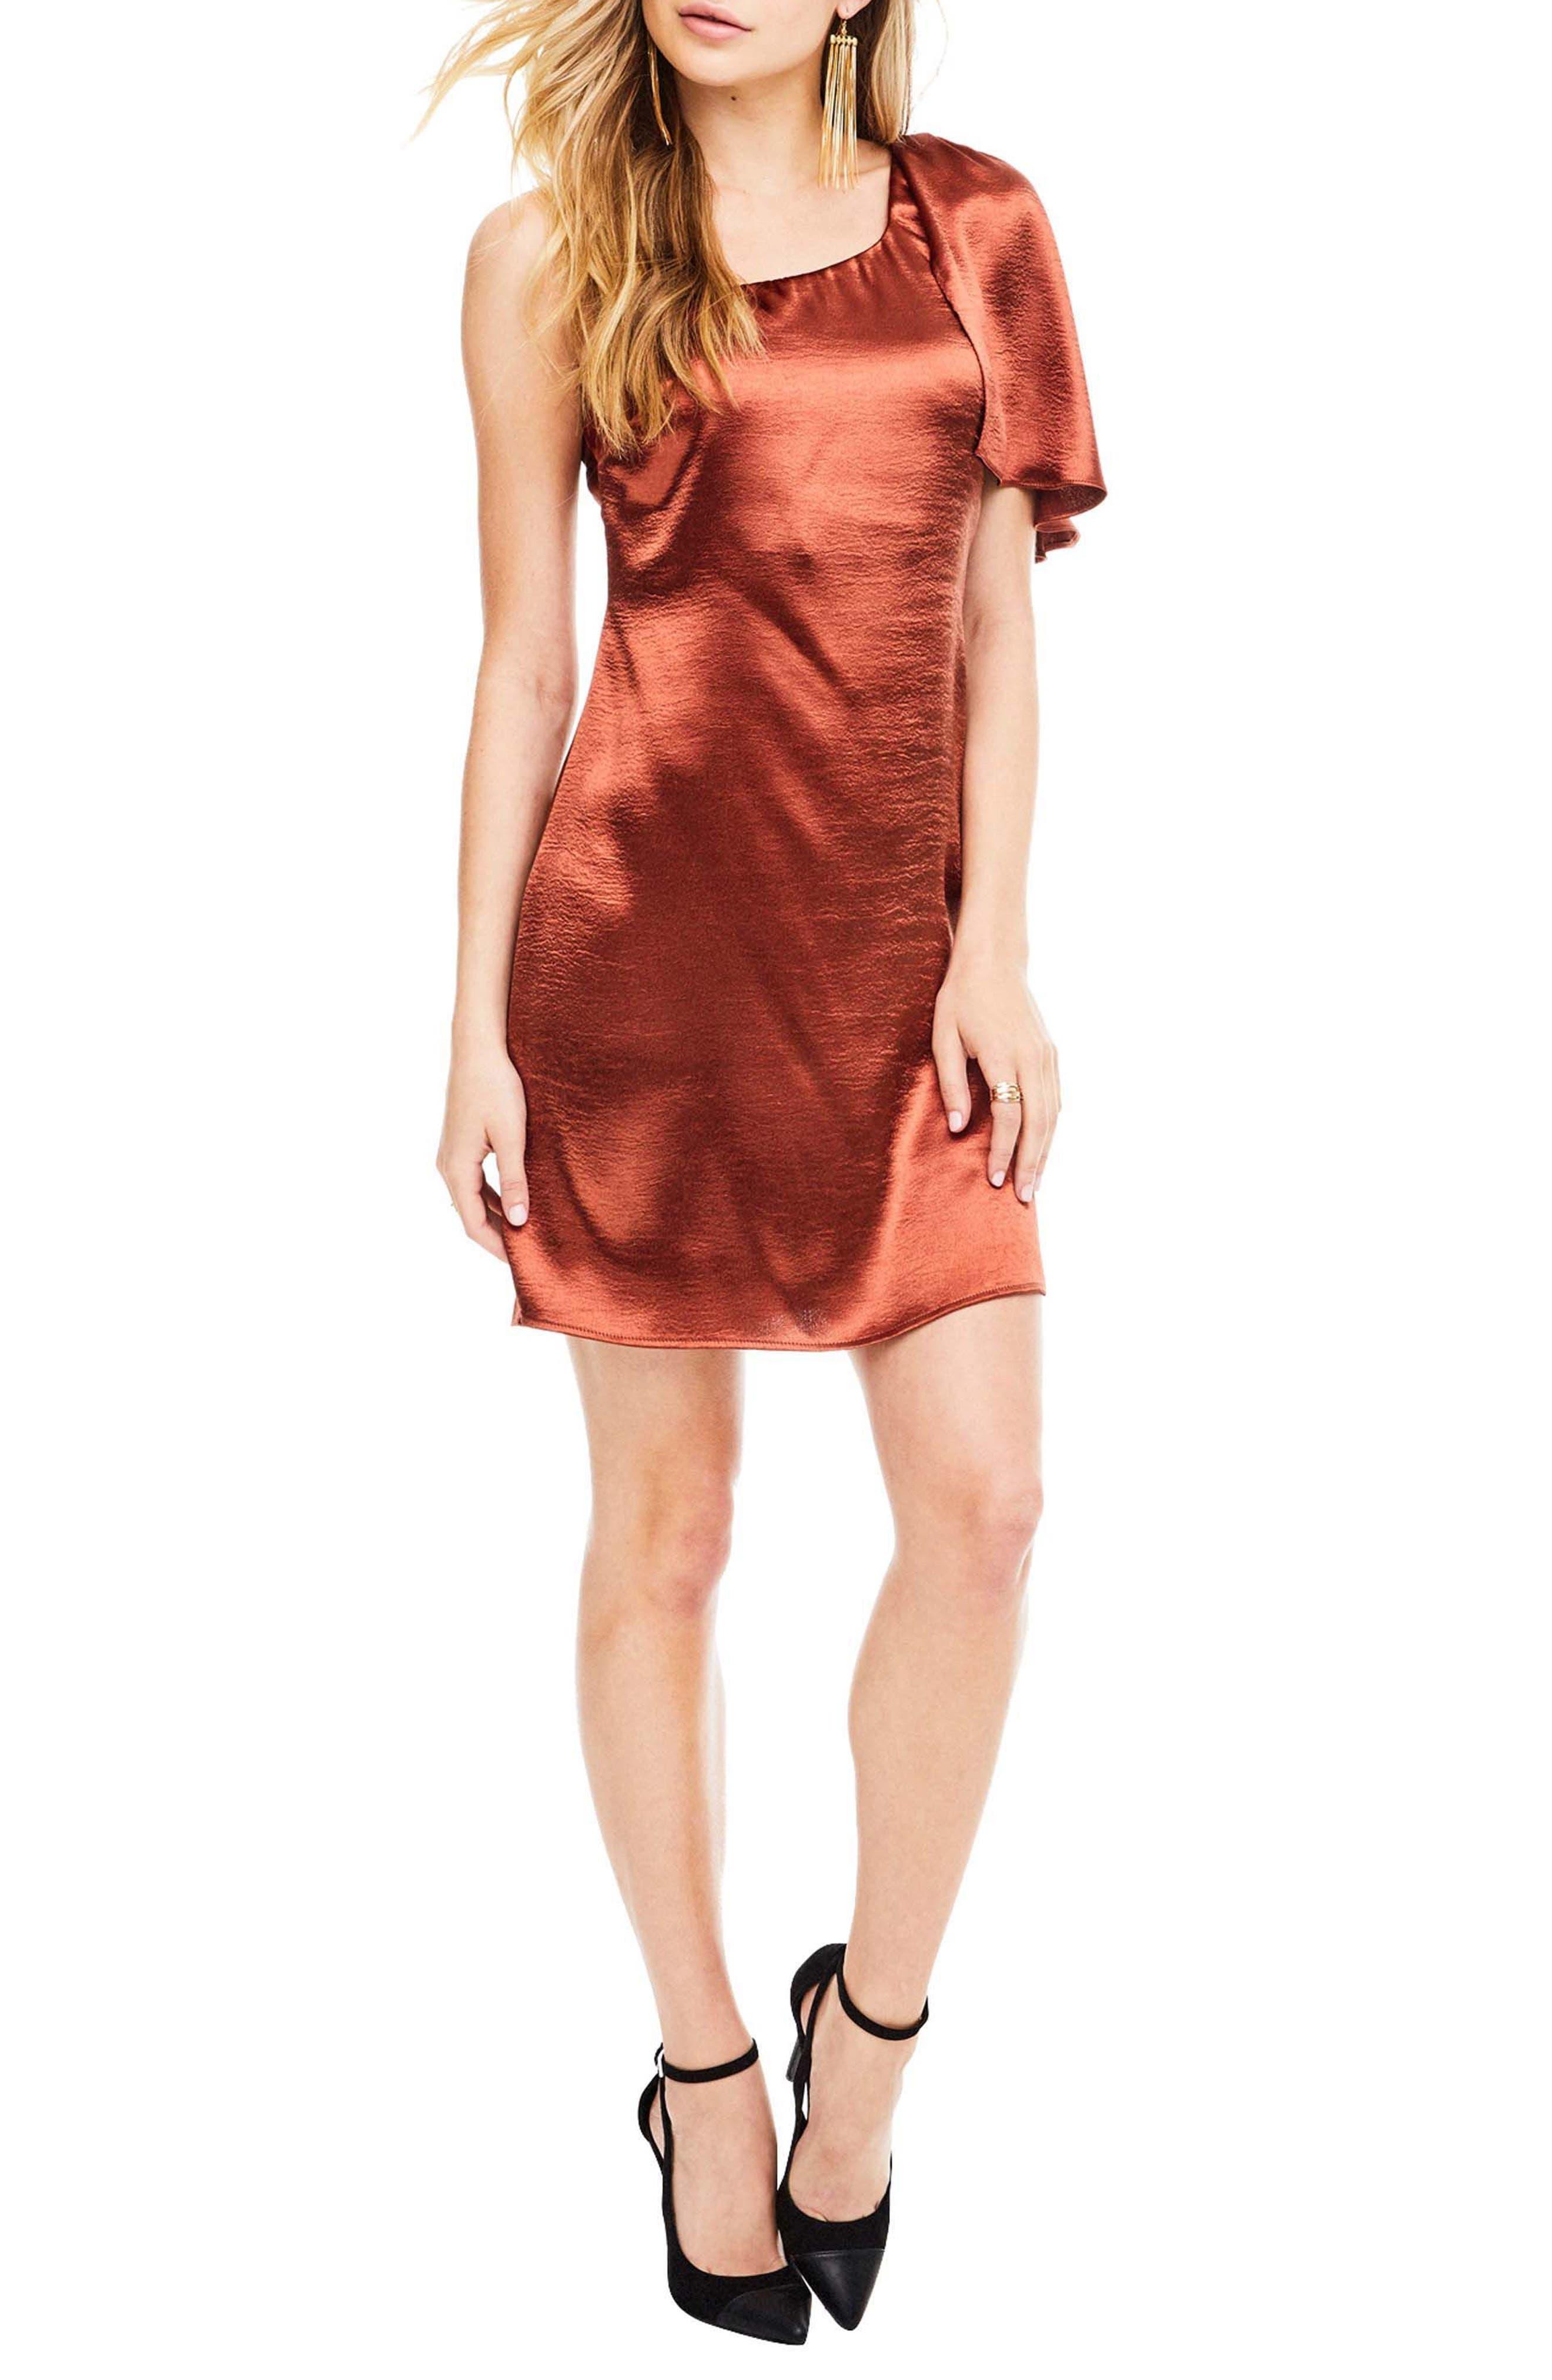 Main Image - ASTR The Label Crystalyn One Shoulder Minidress